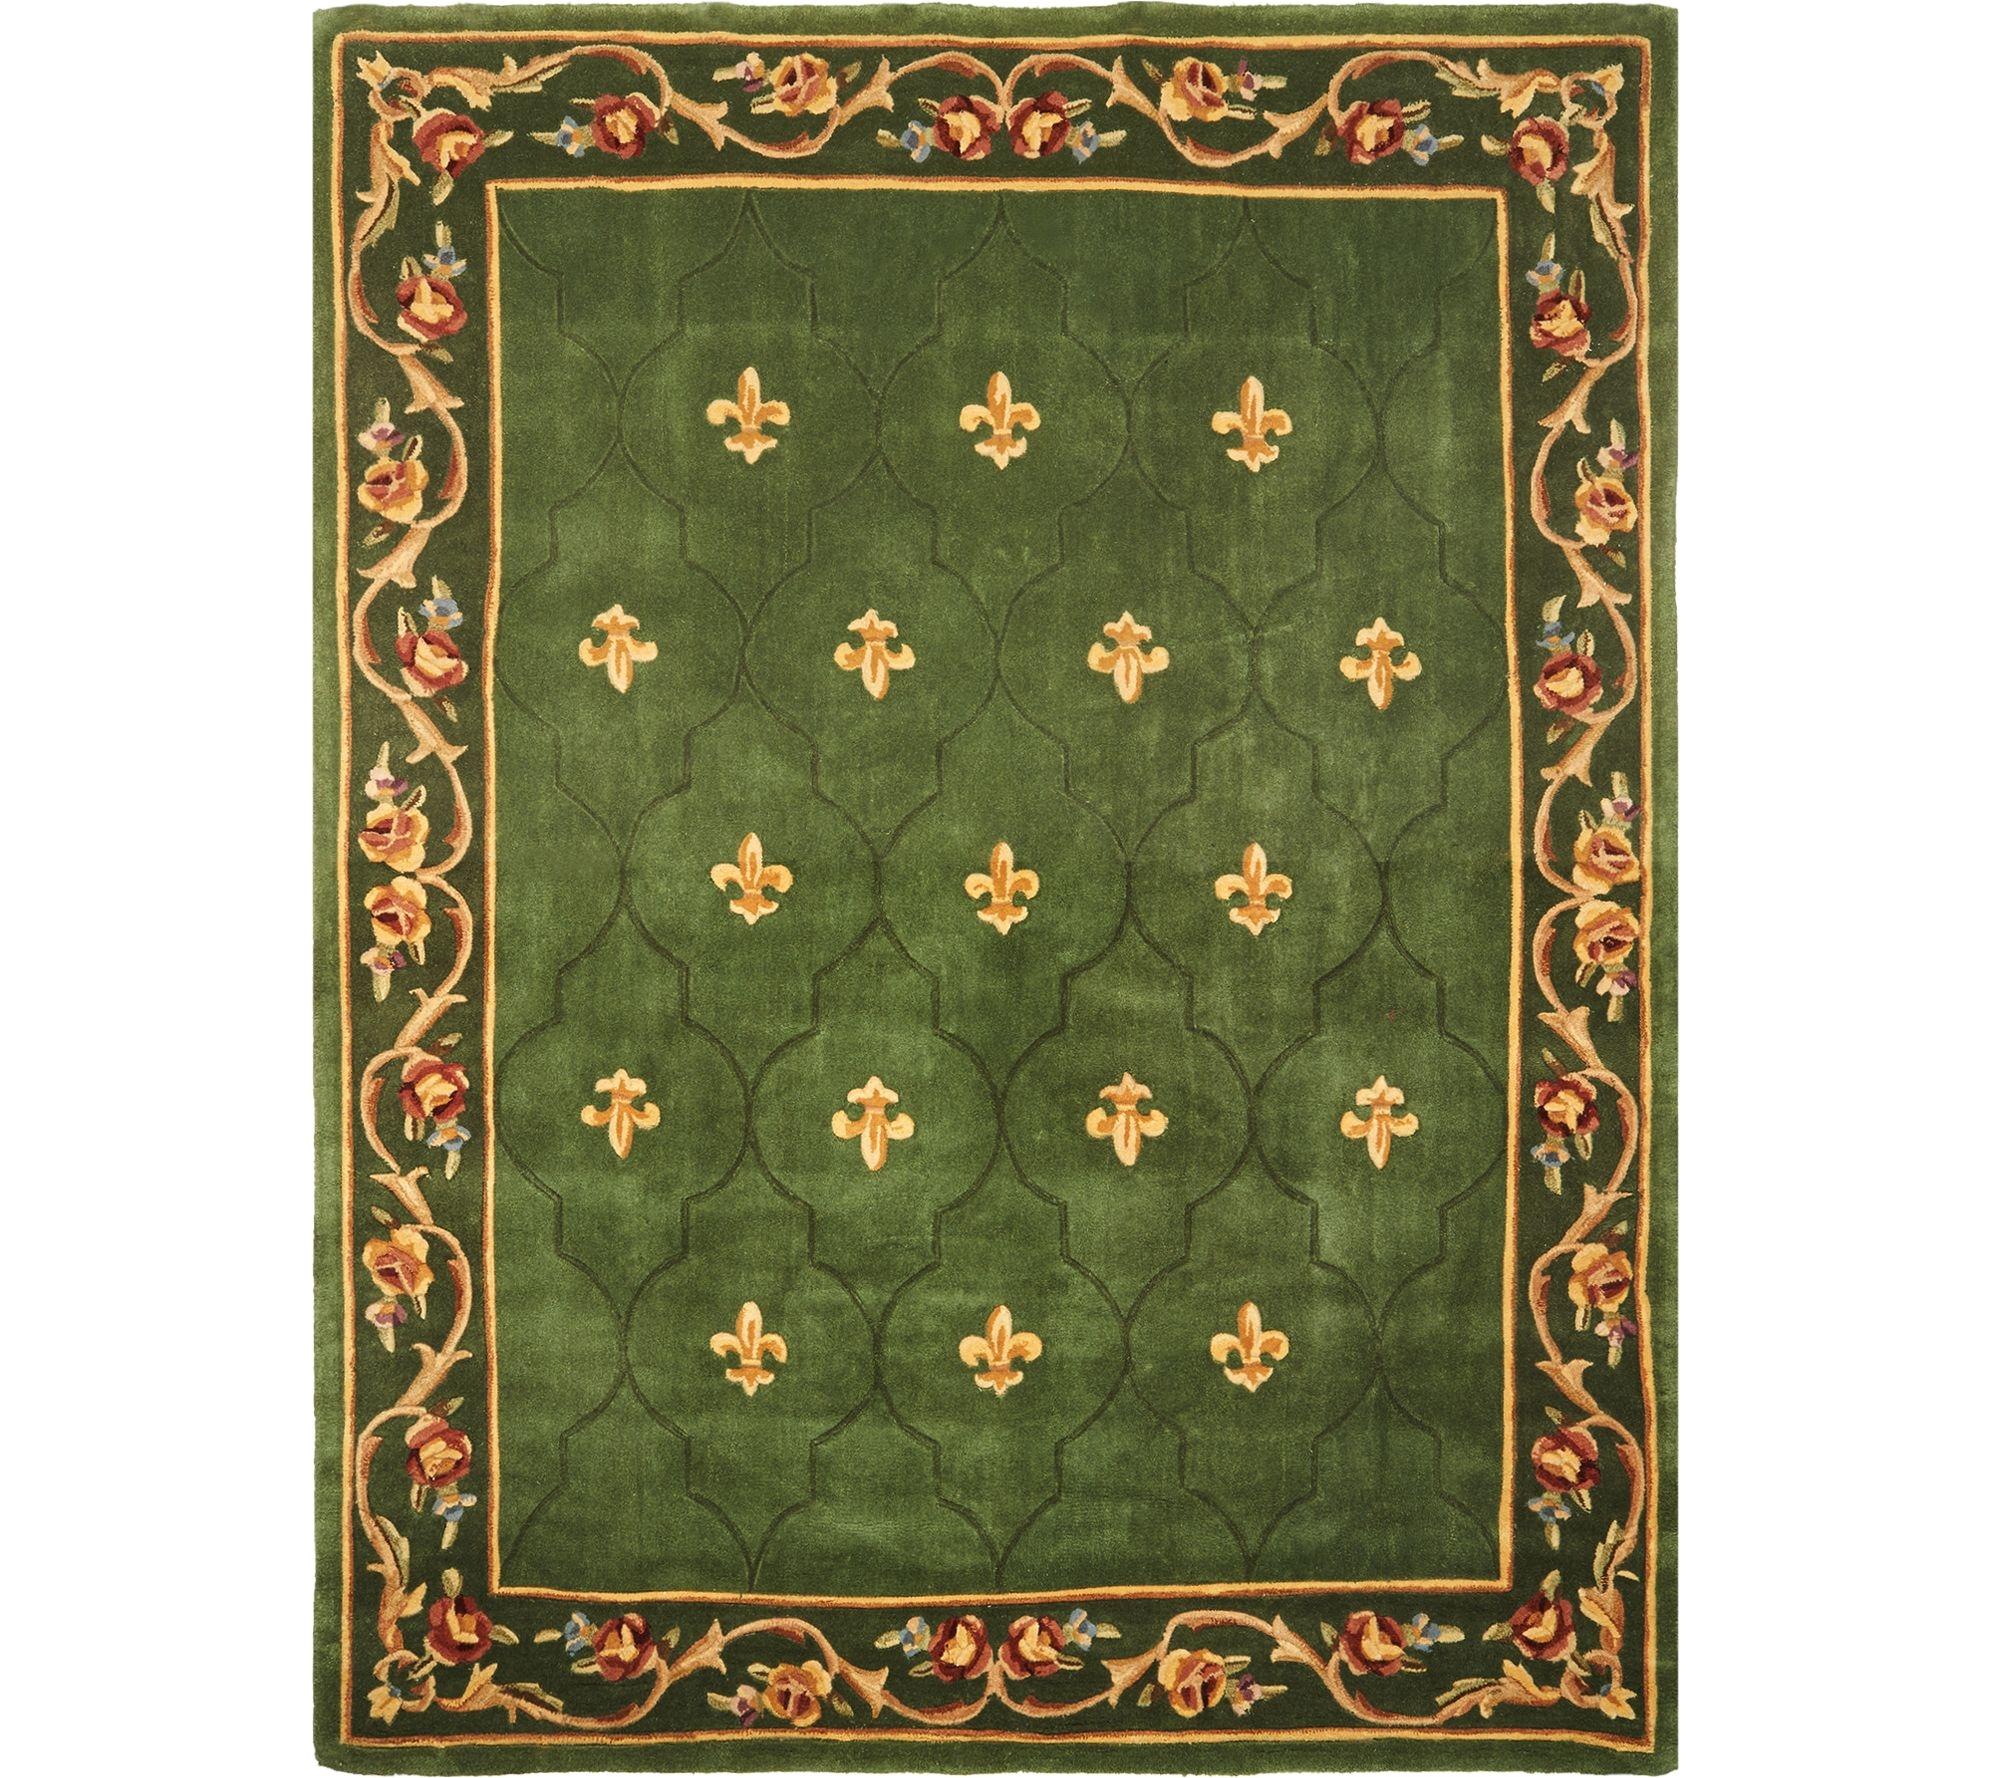 royal palace special edition 8 x10 6 fleur de lis wool rug page 1 qvc com